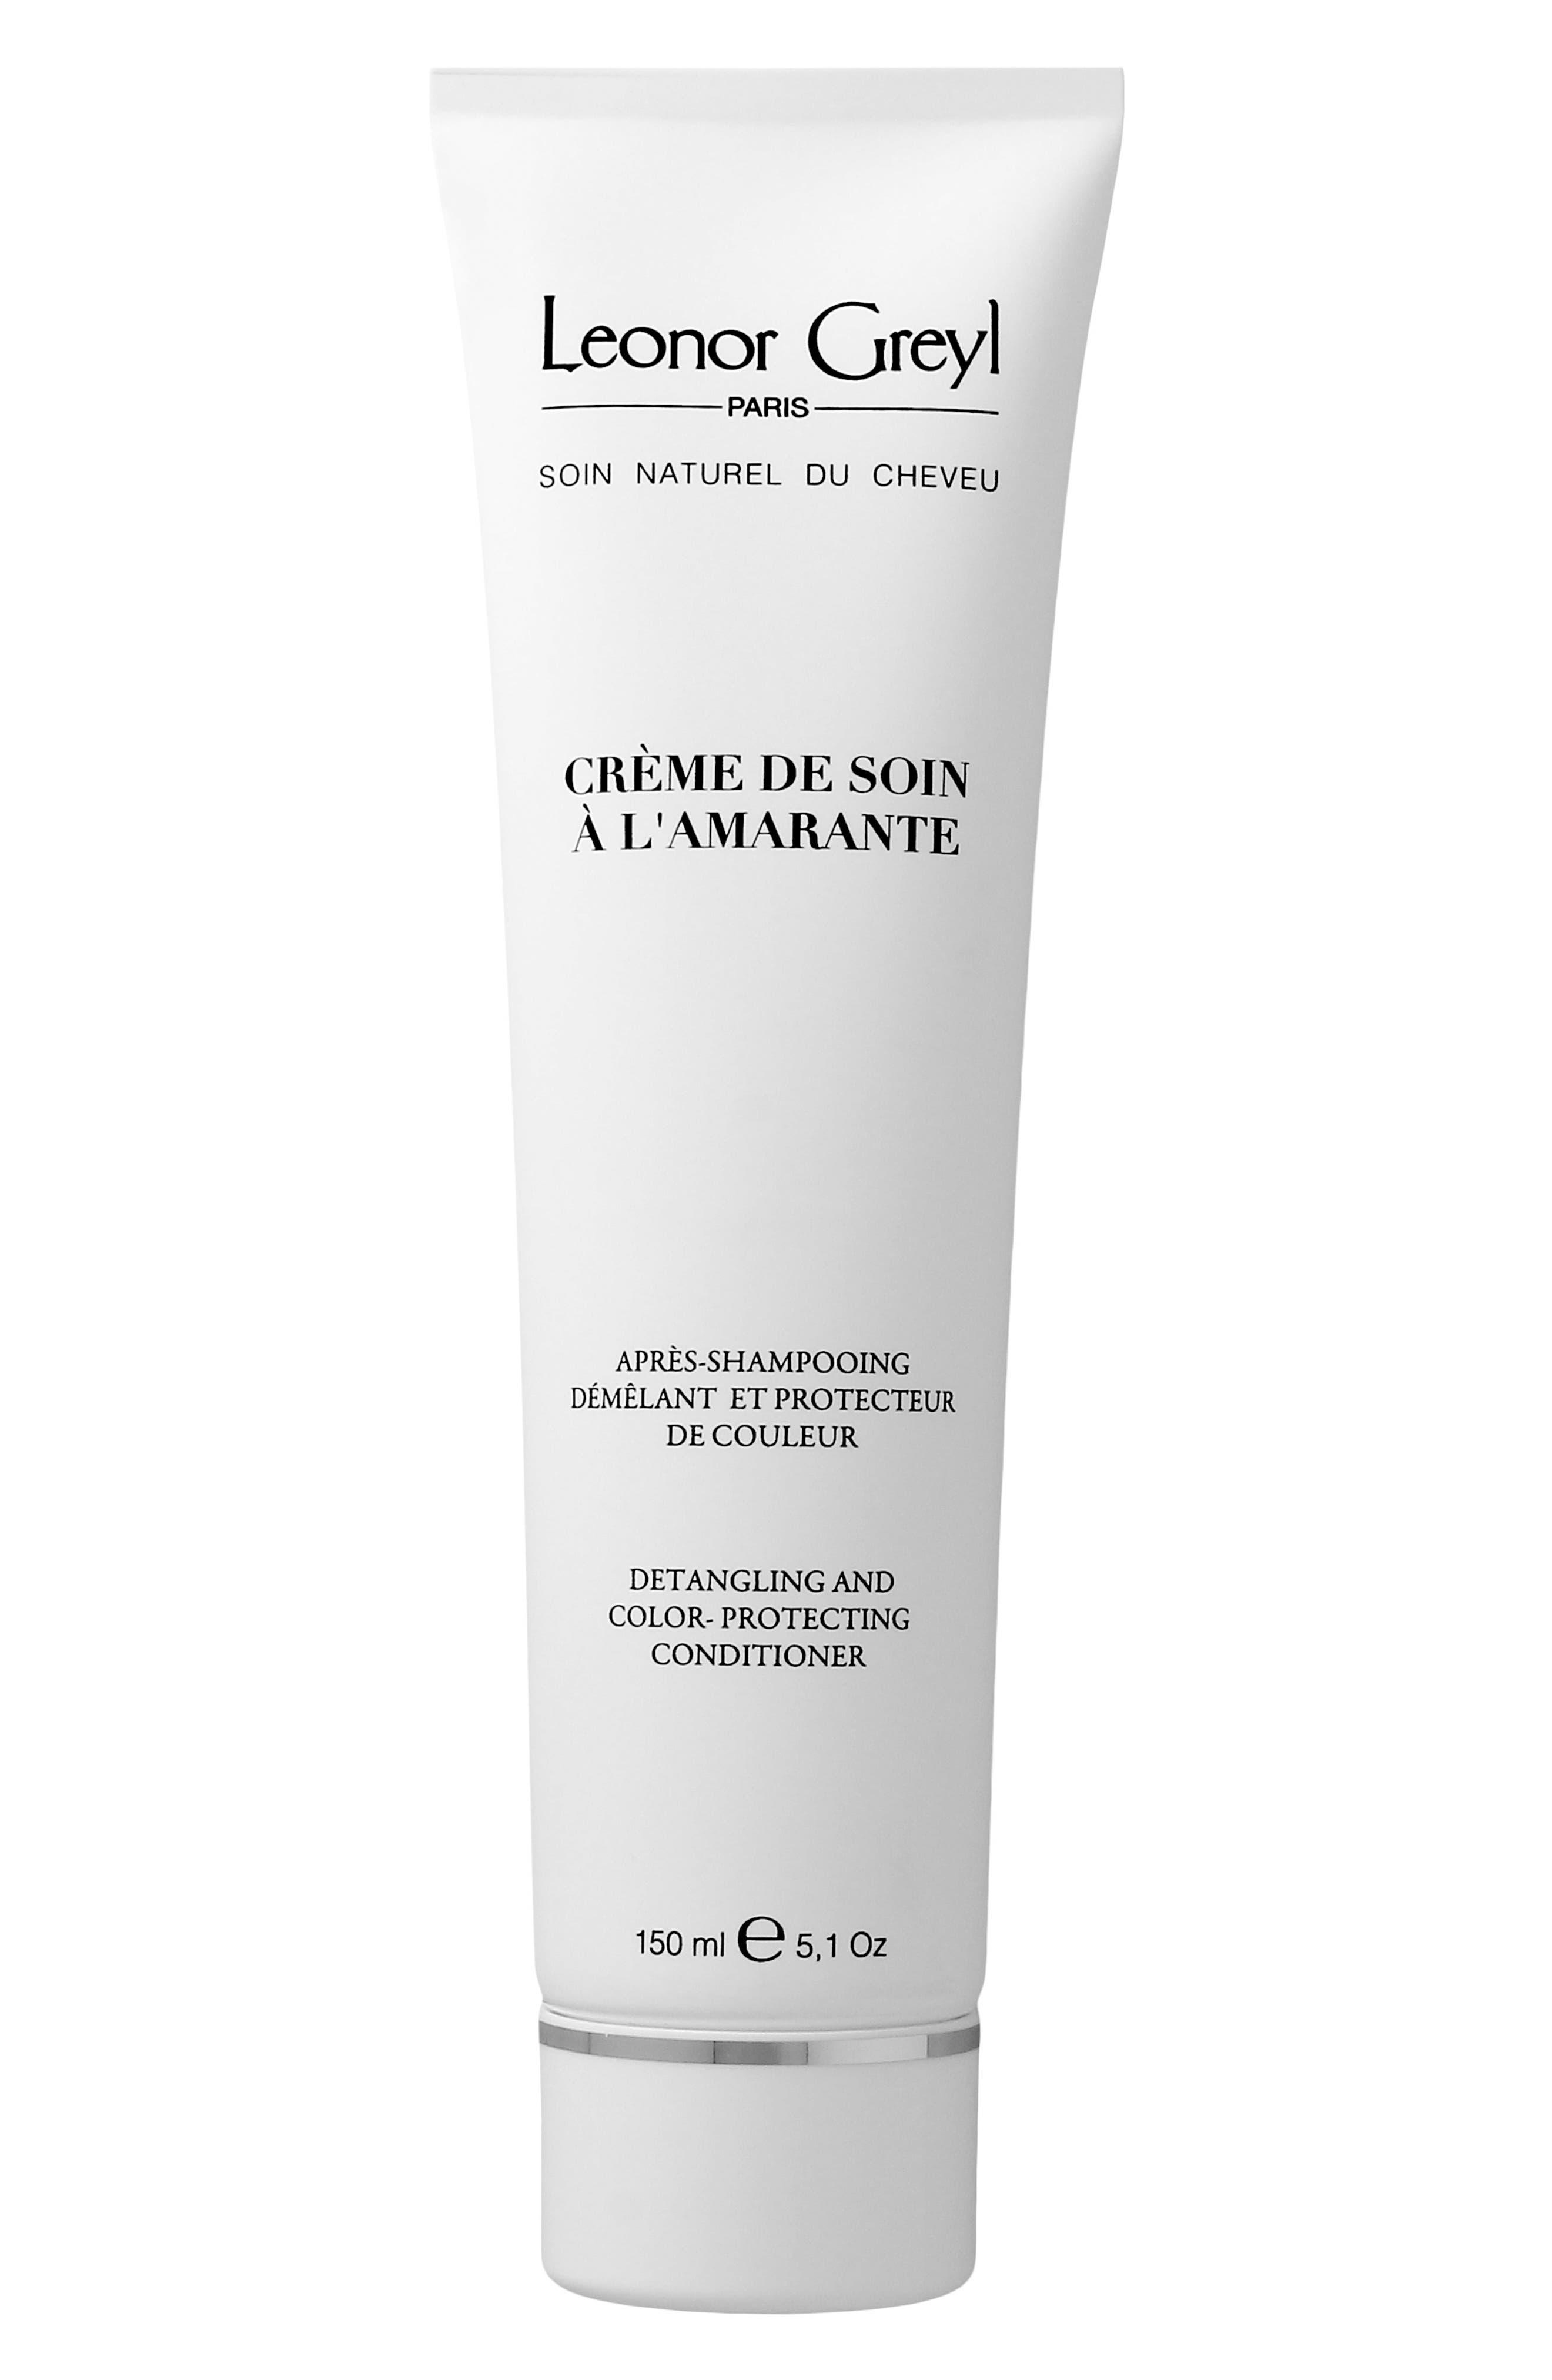 Leonor Greyl PARIS Crème de Soin a l'Amarante Conditioner